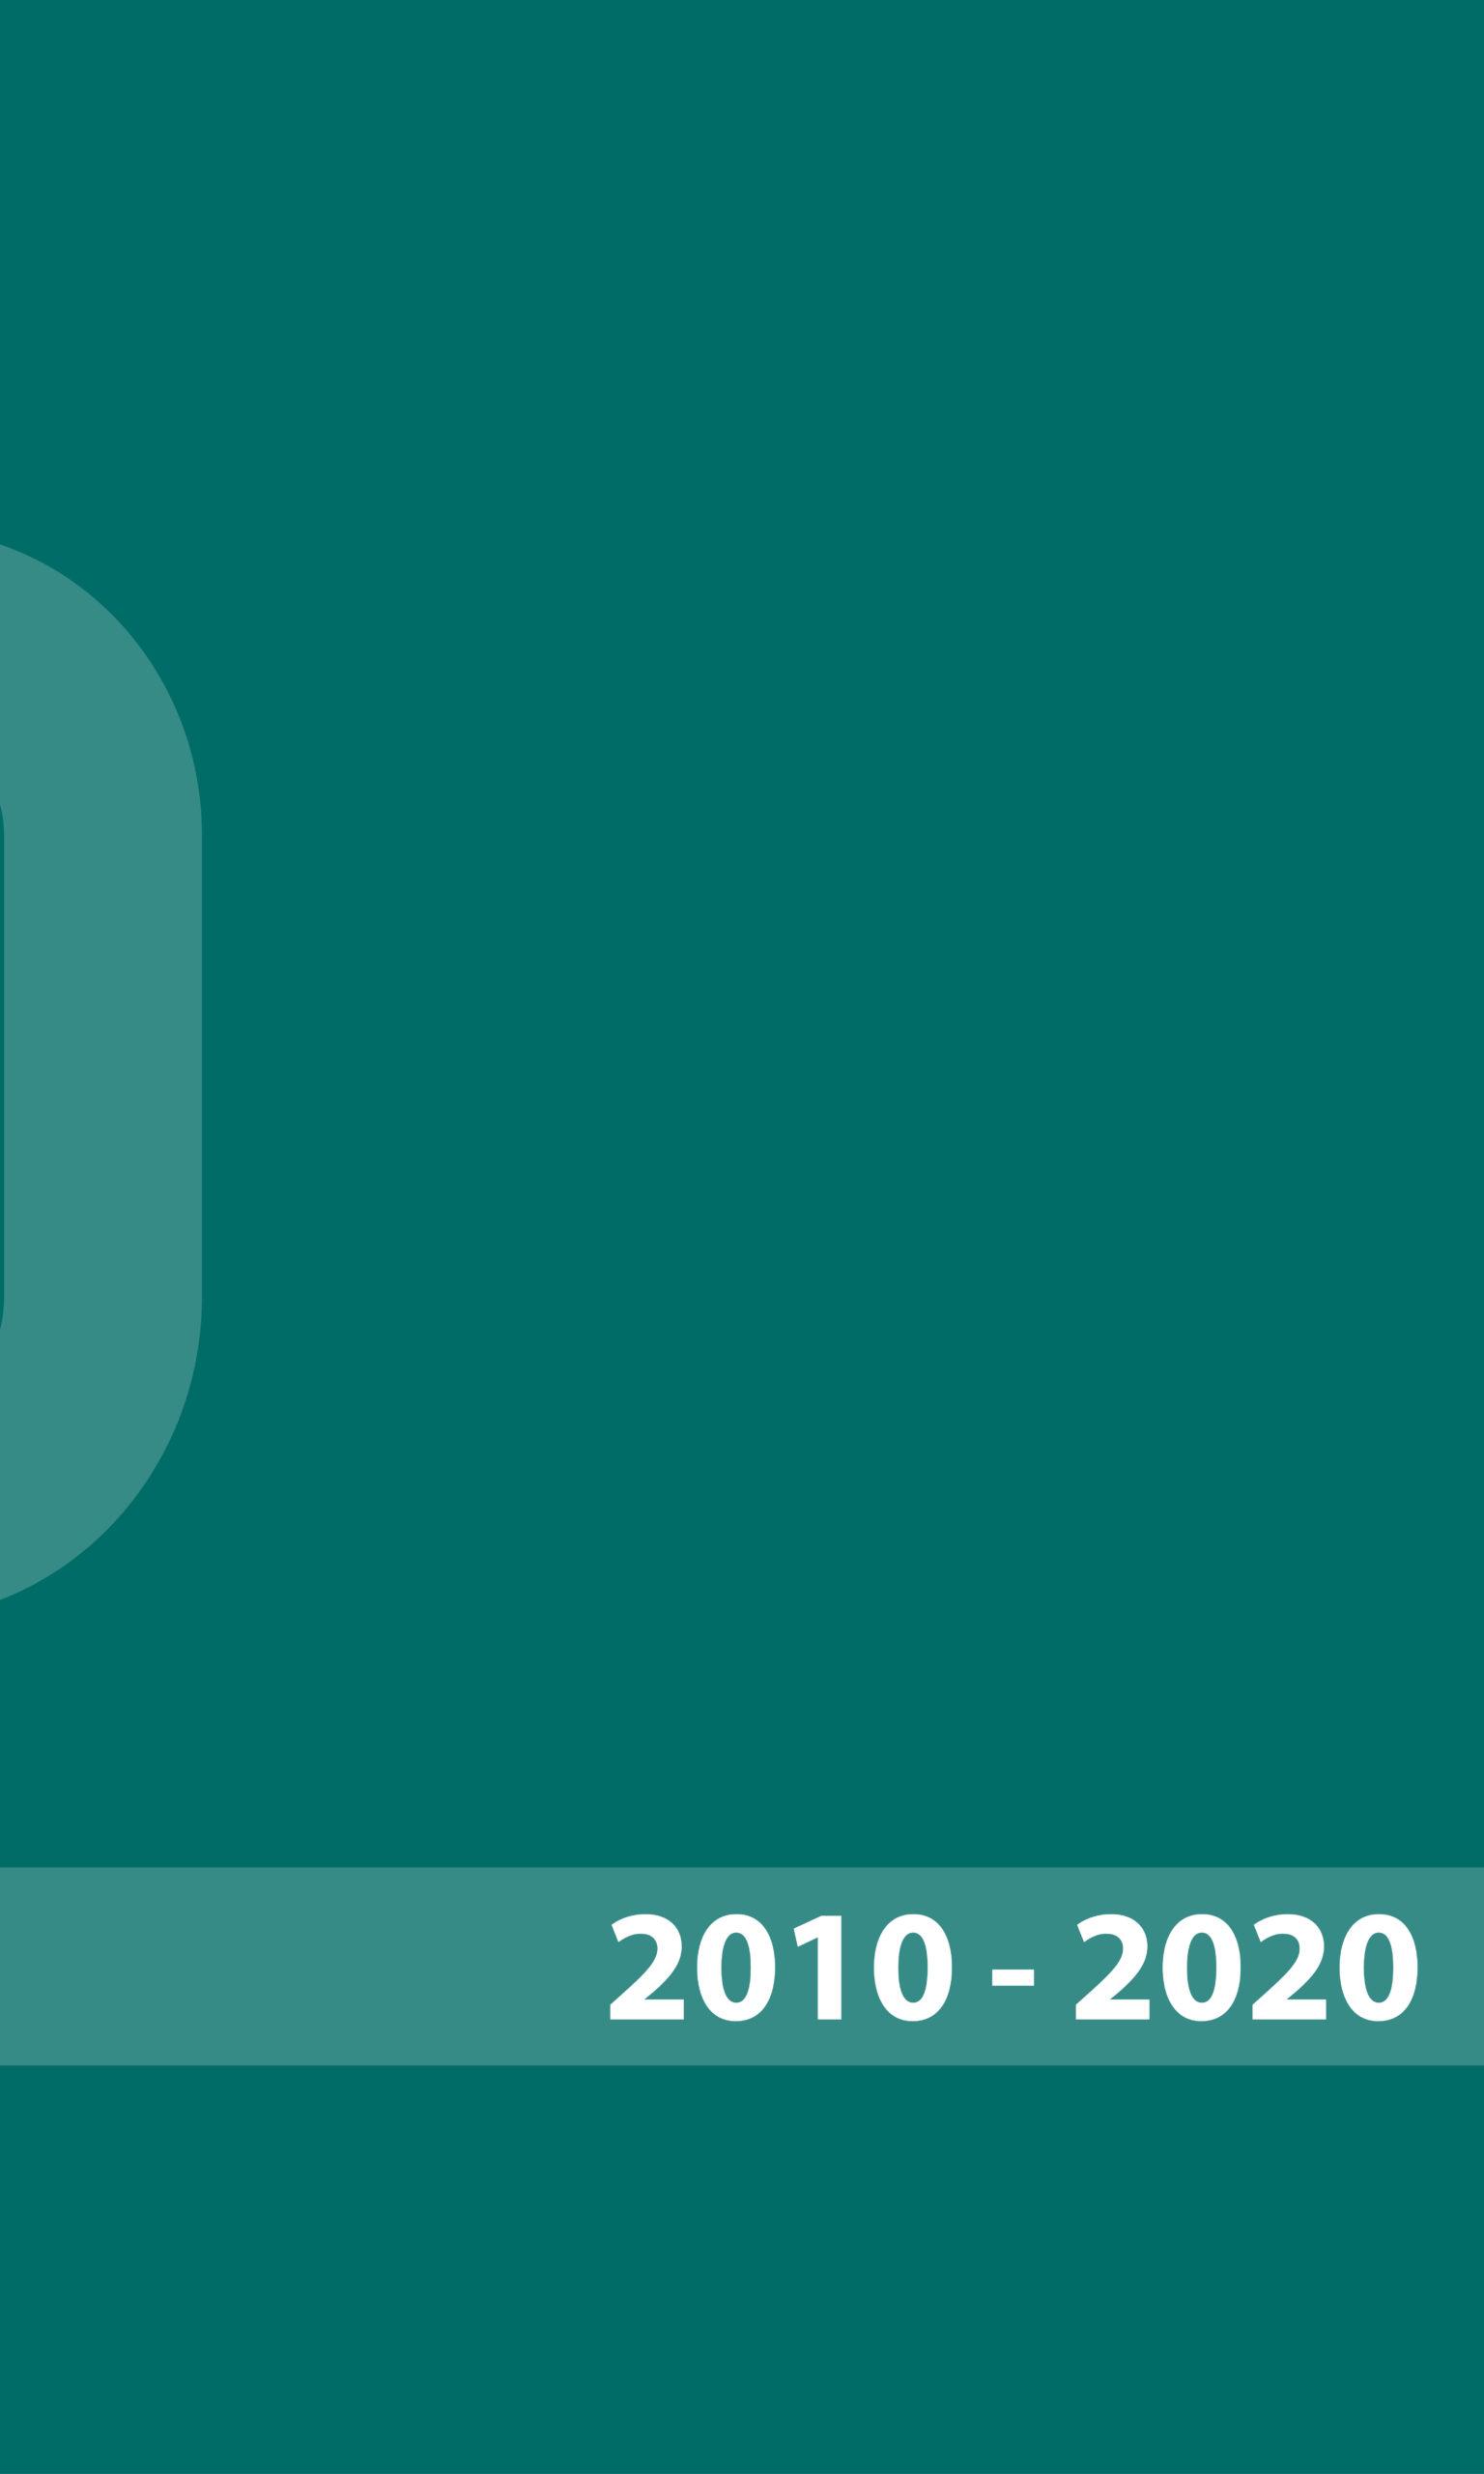 2010-2020